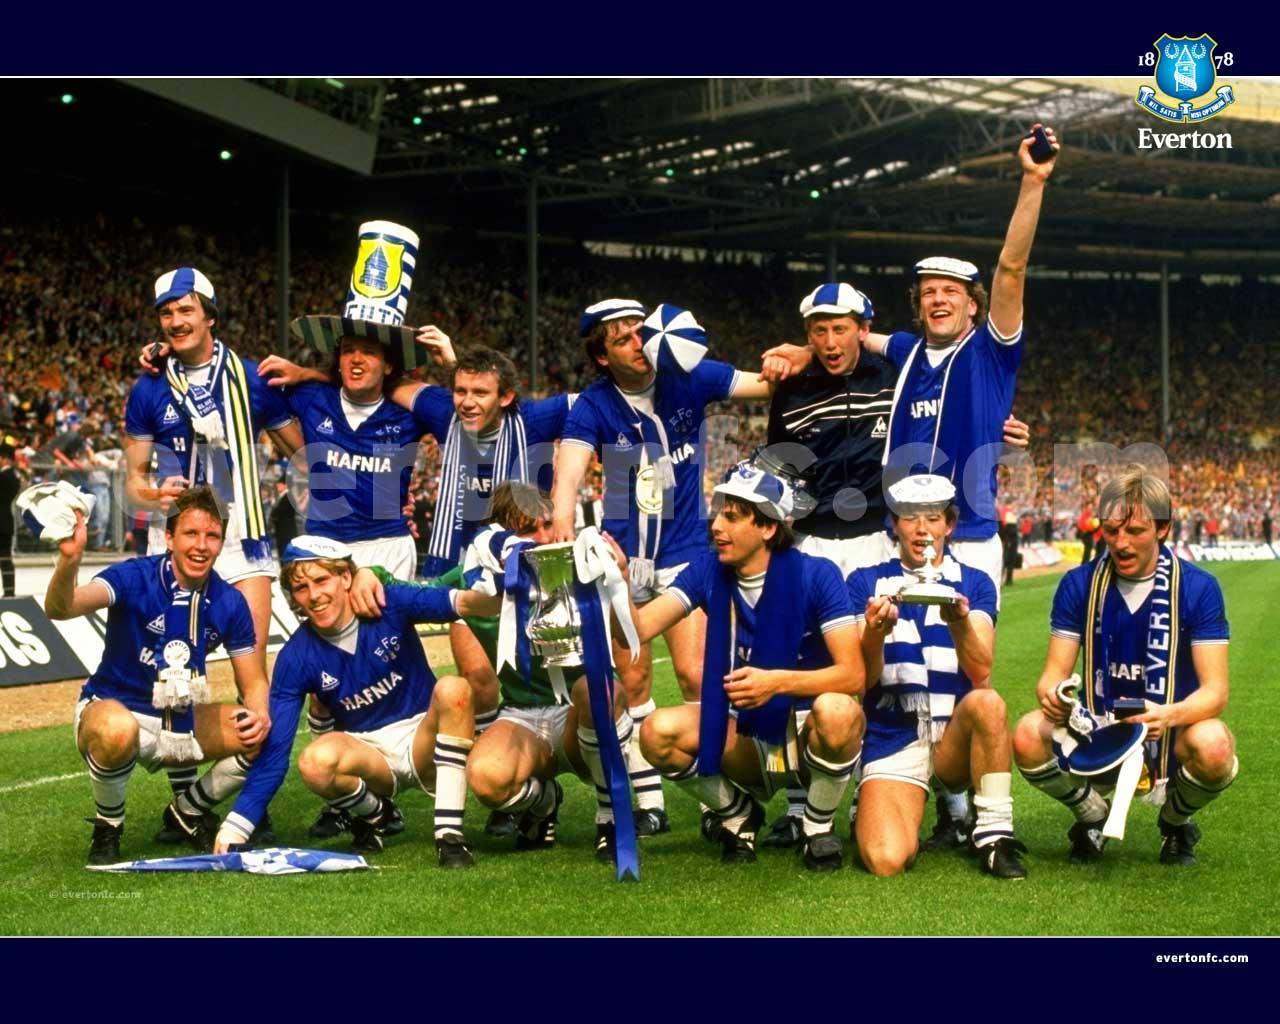 Everton F.C. Wallpapers - Wallpaper Cave